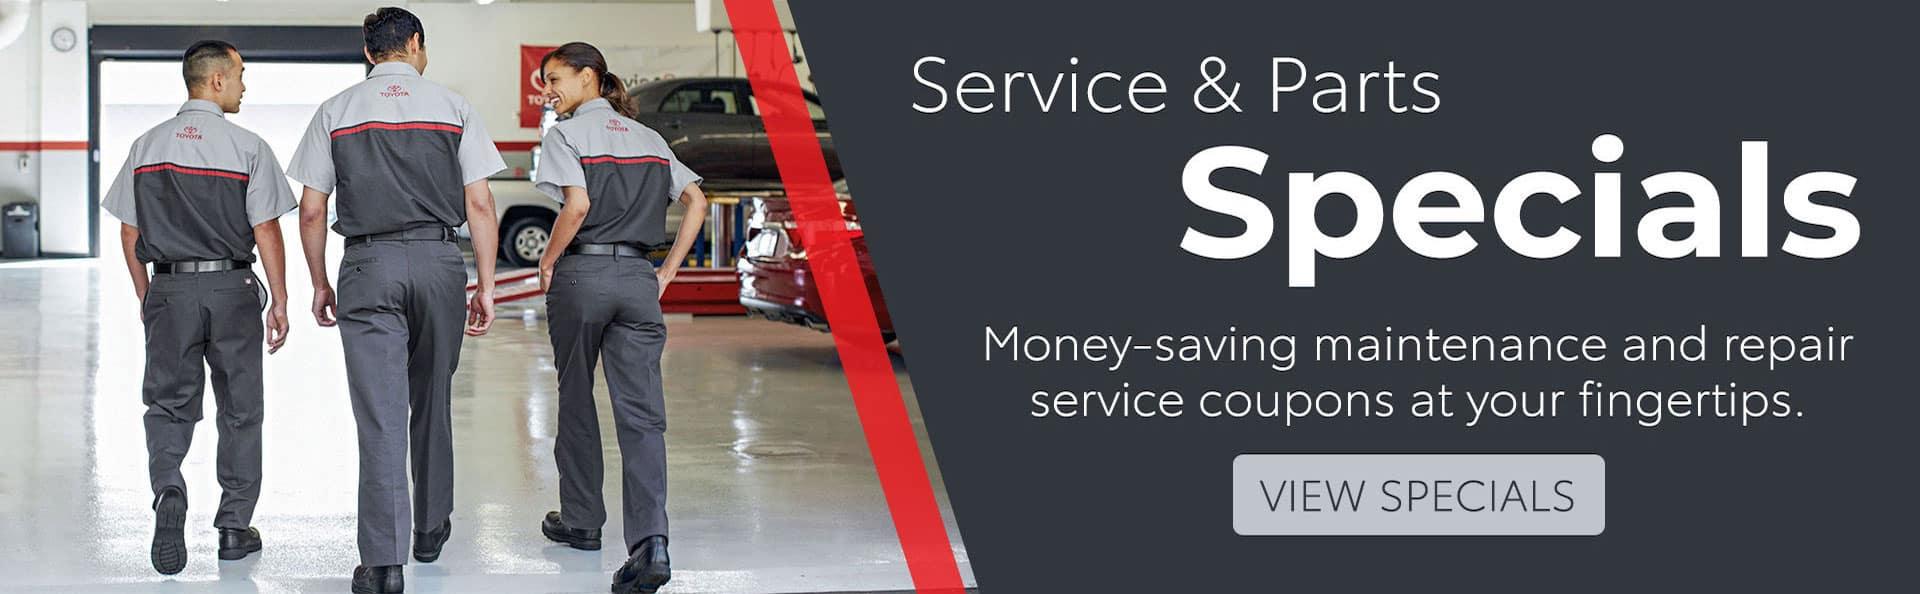 Toyota Service Parts Specials